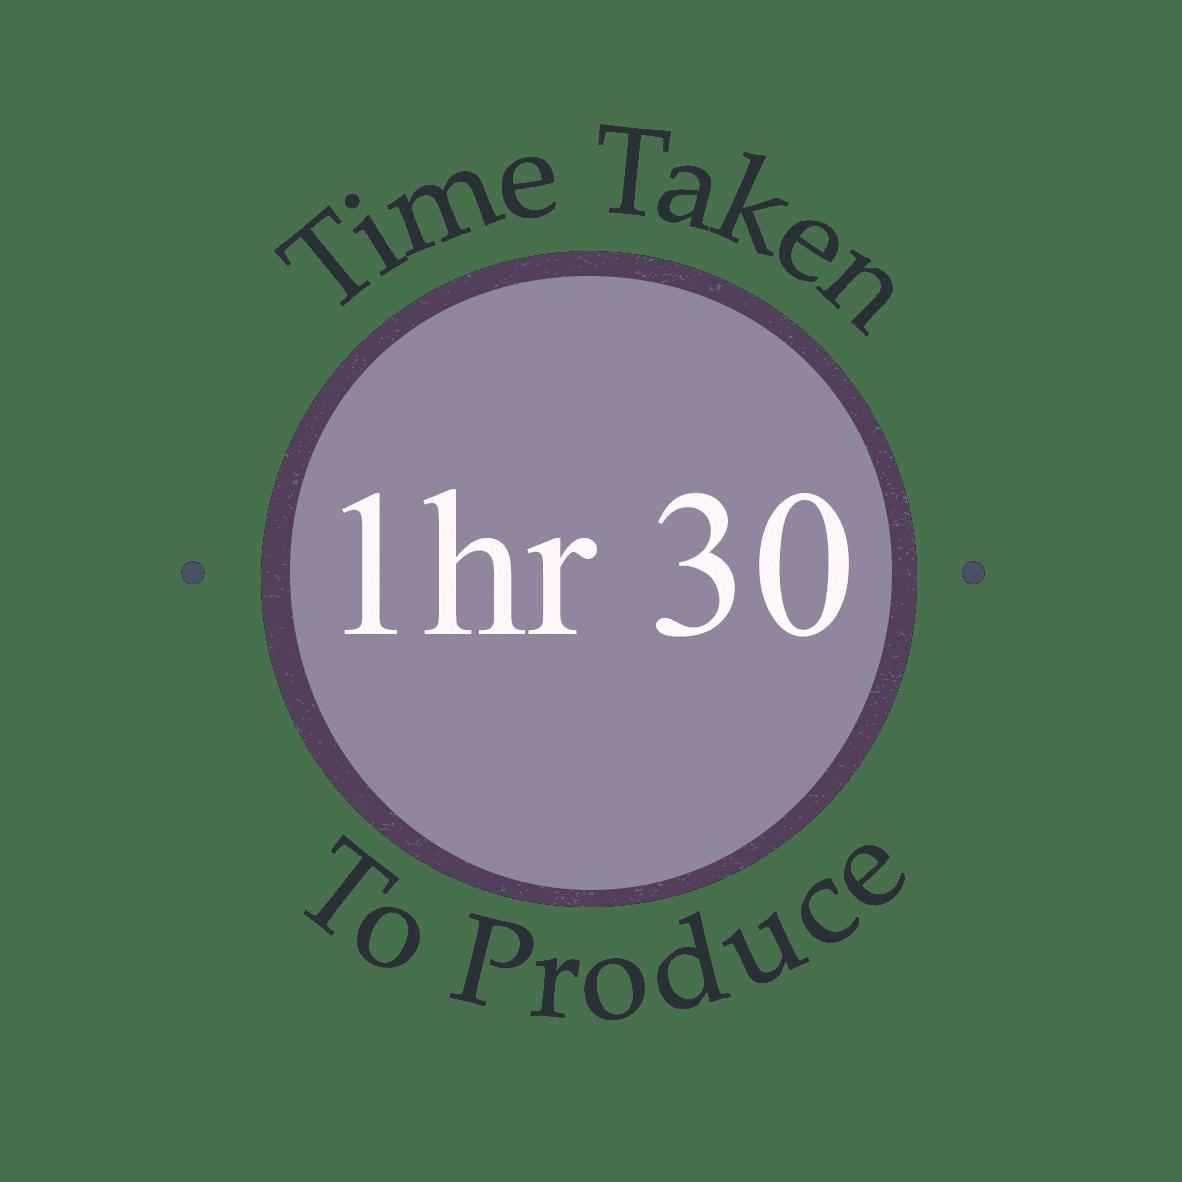 1 hour 30 minutes to make recipe